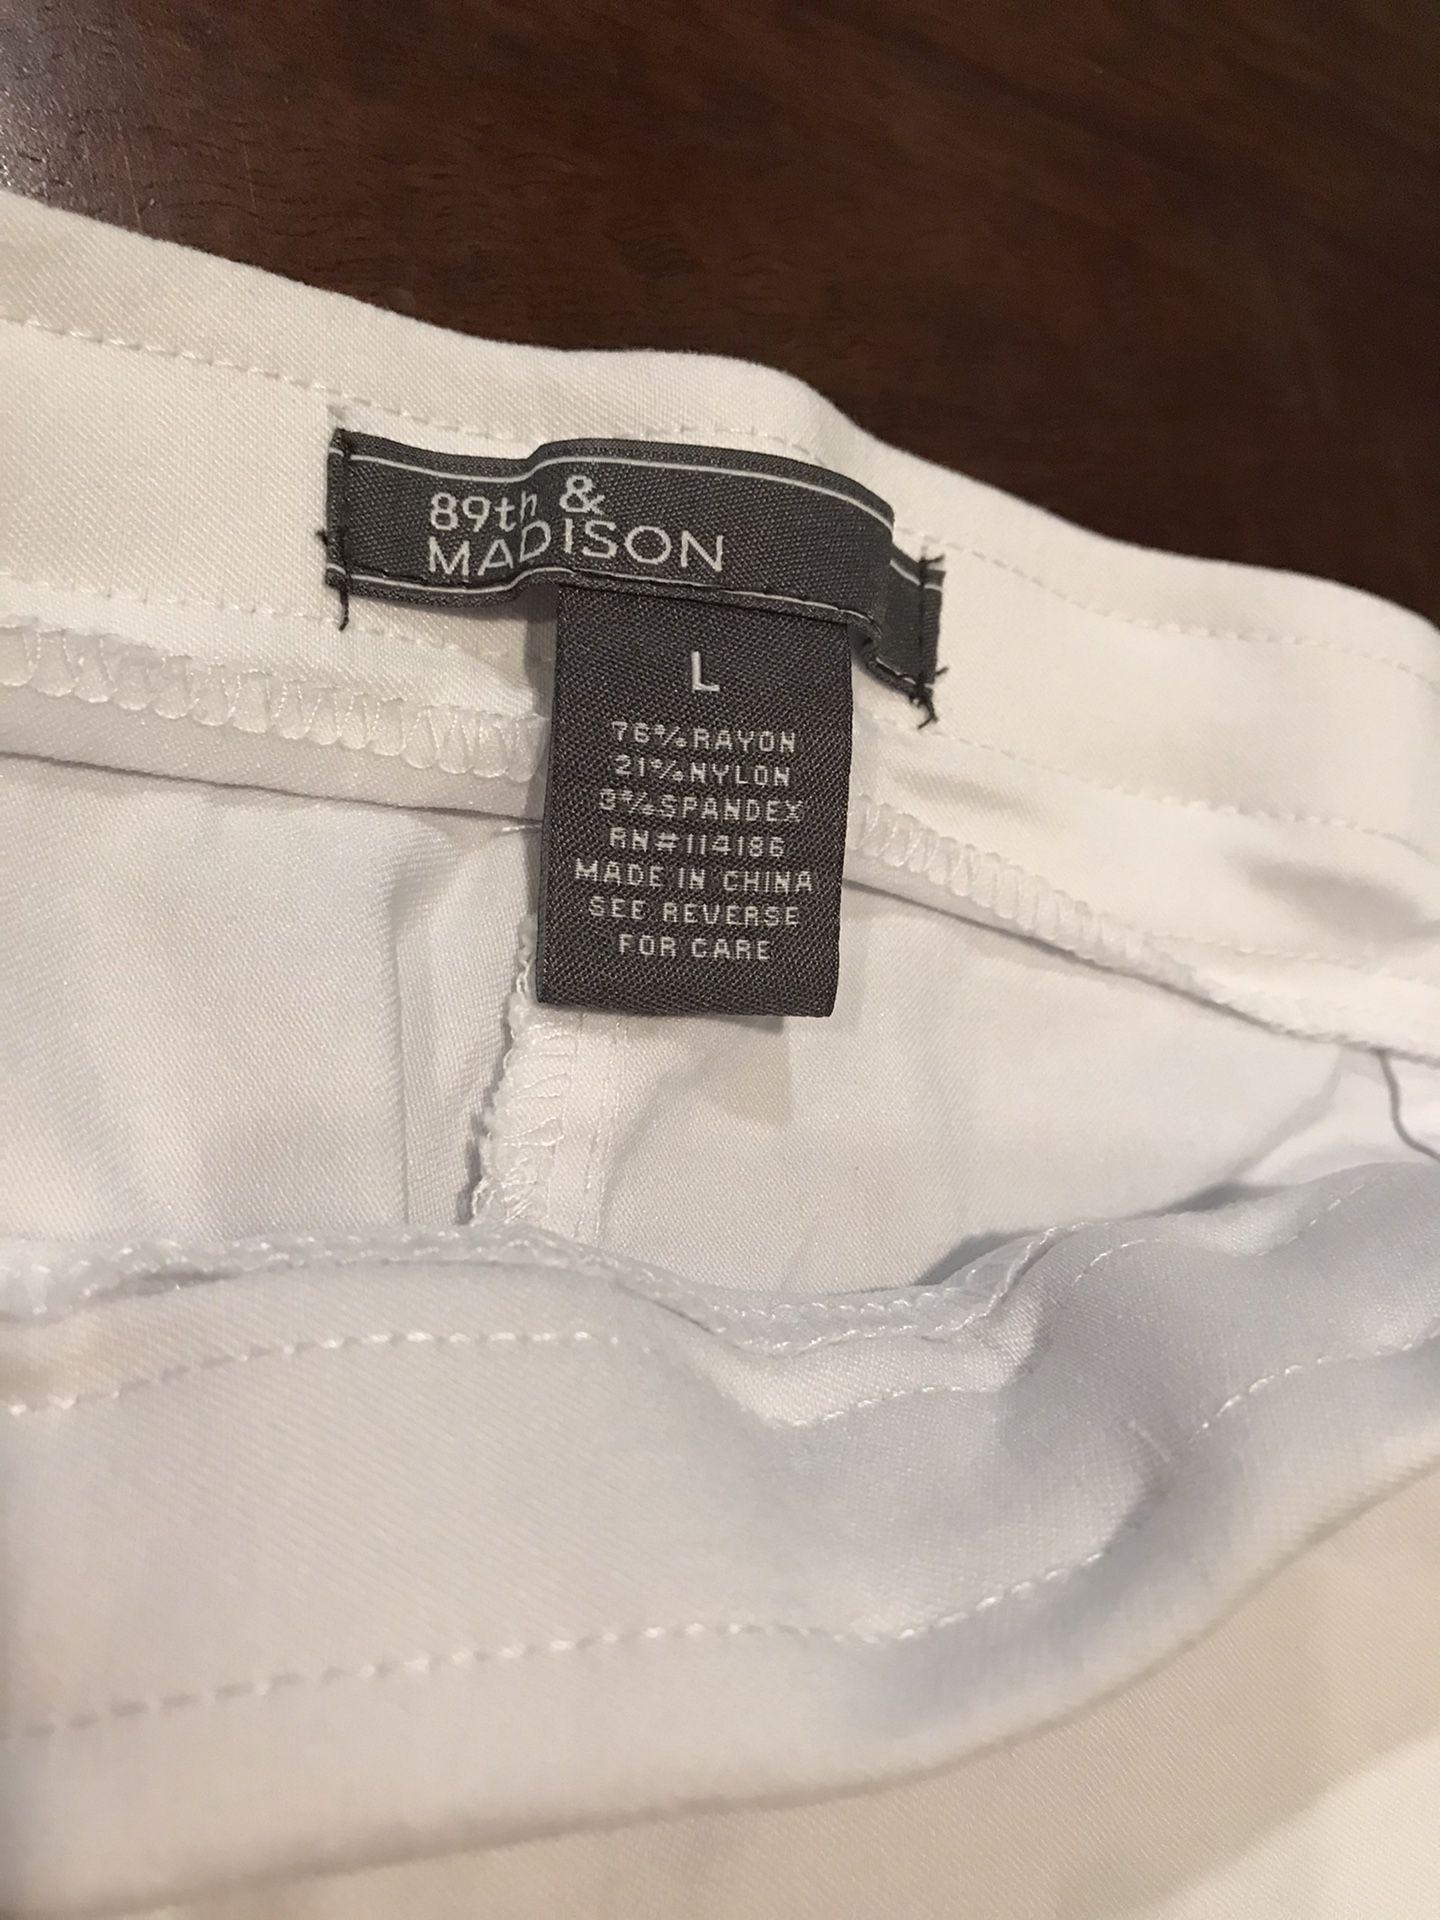 89th & Madison L cropped pants!